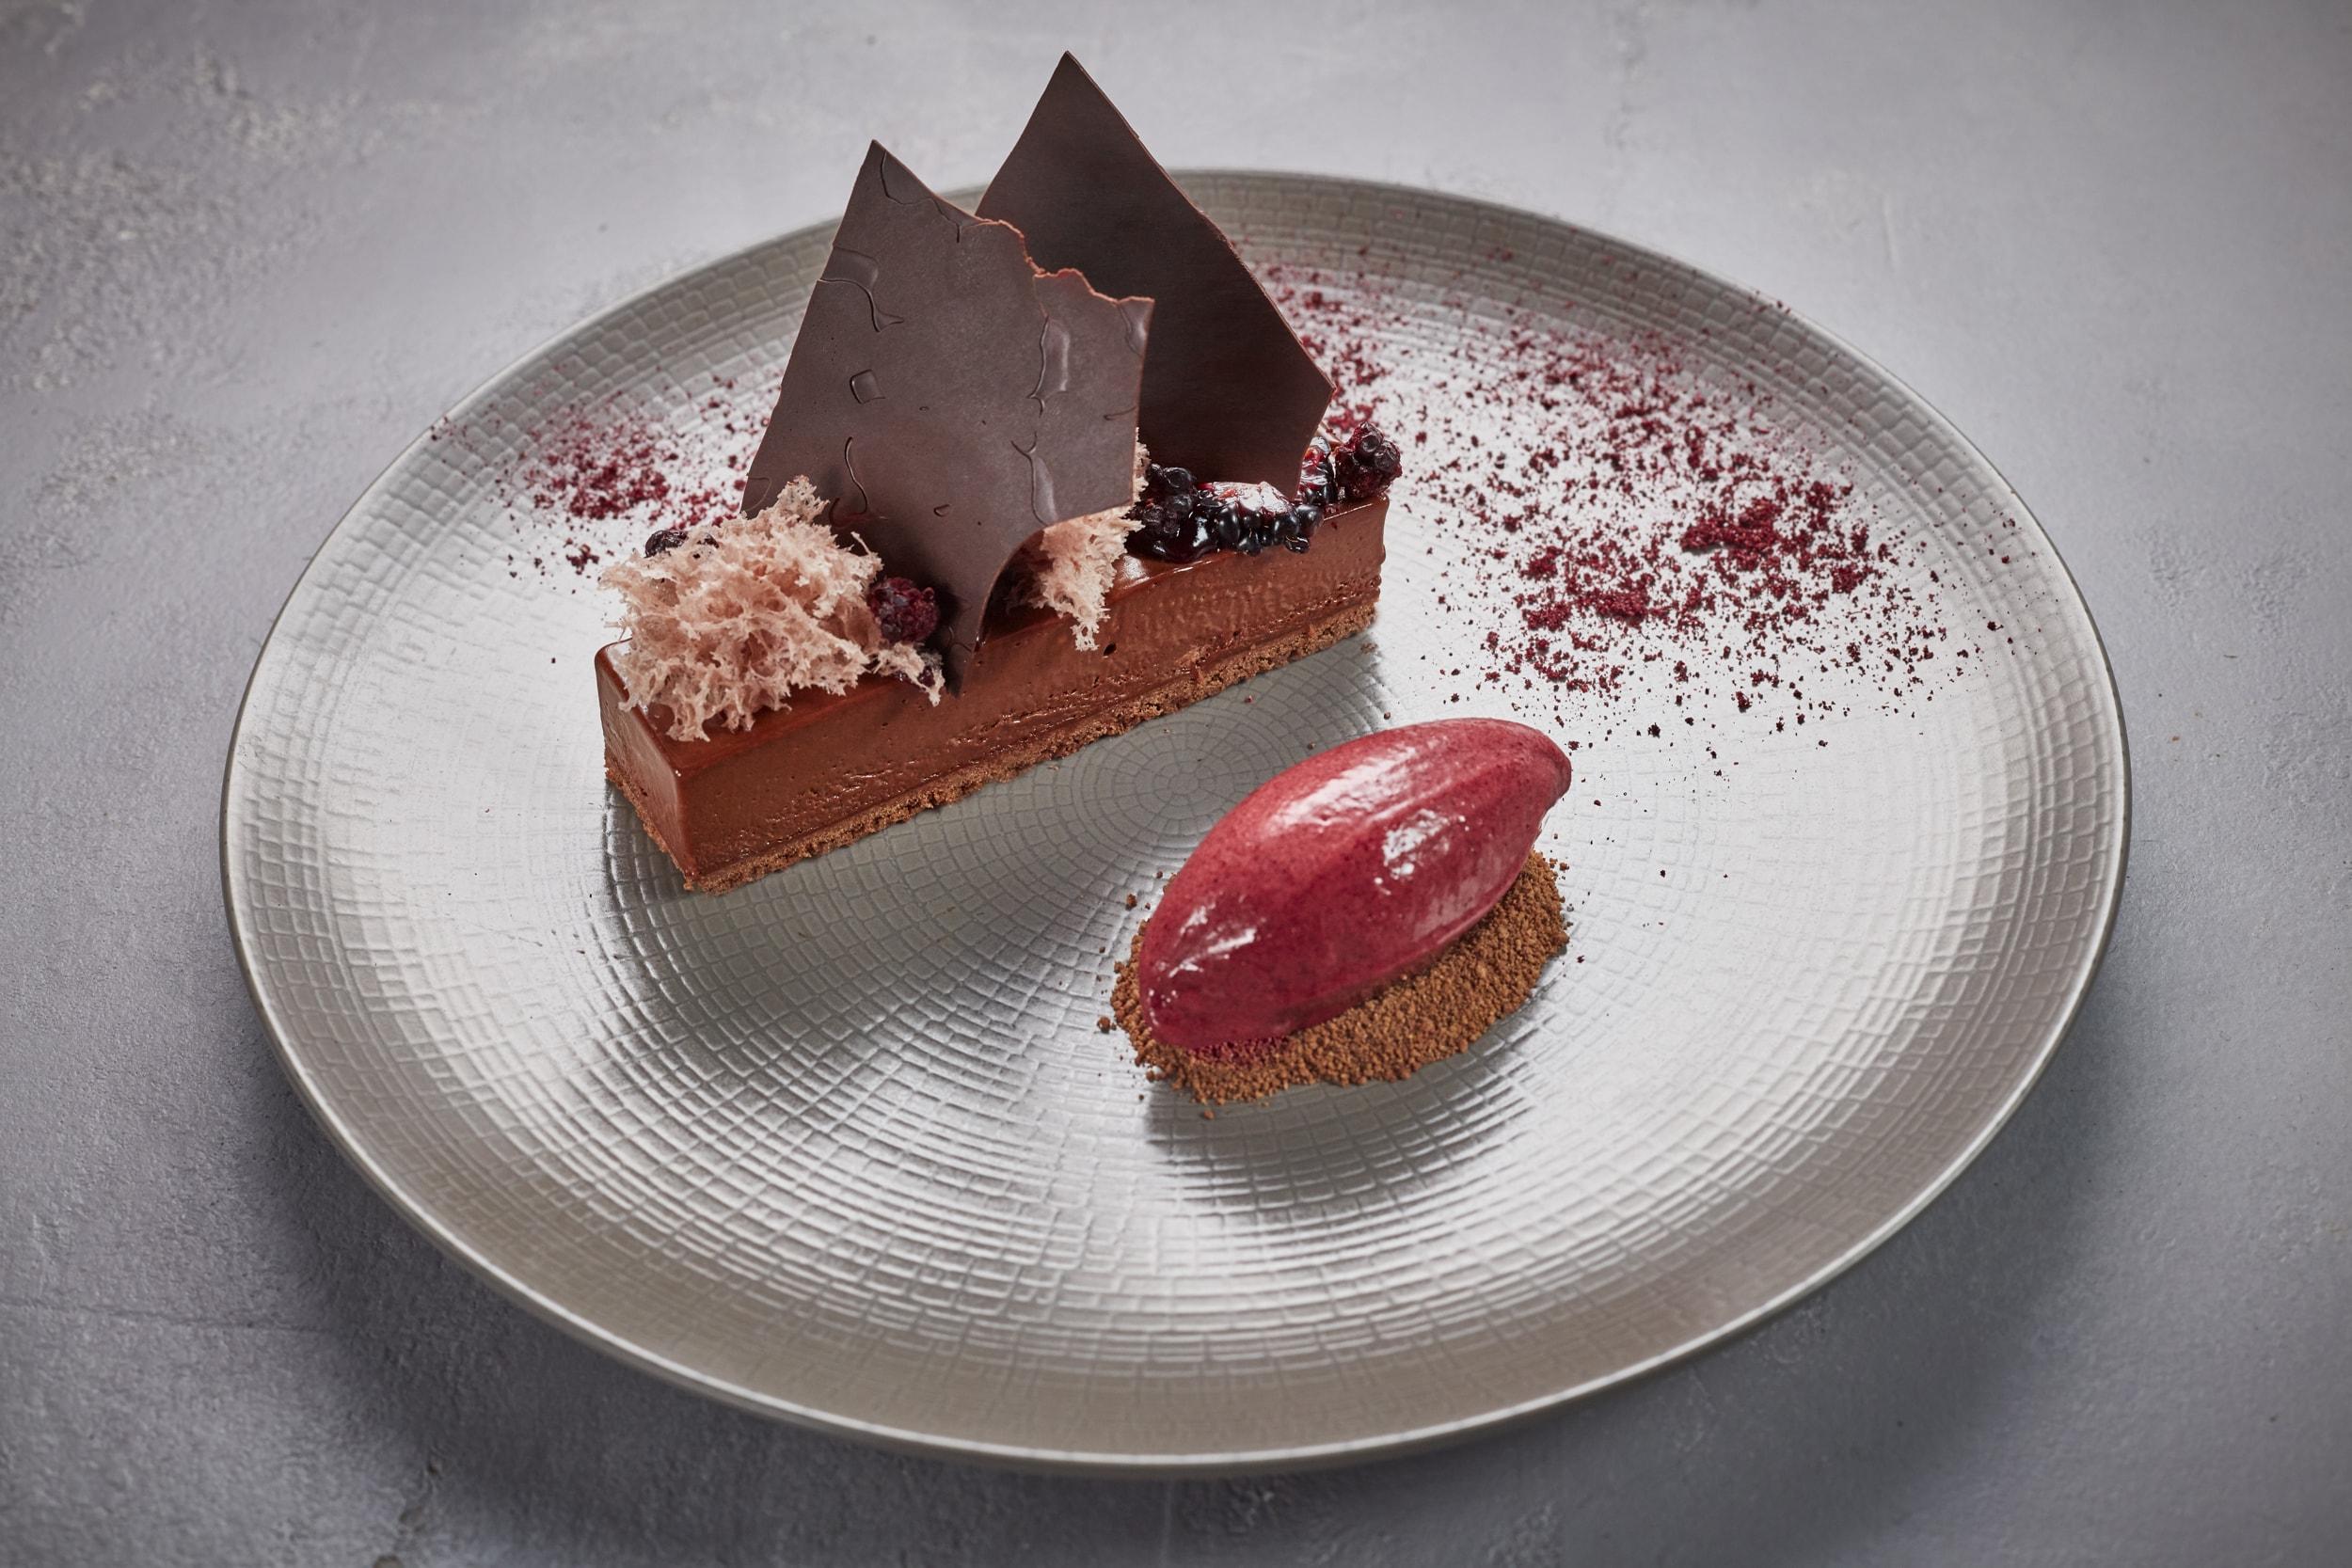 170404_MRestaurant_Chocolate&Blackberries_11-min.jpg